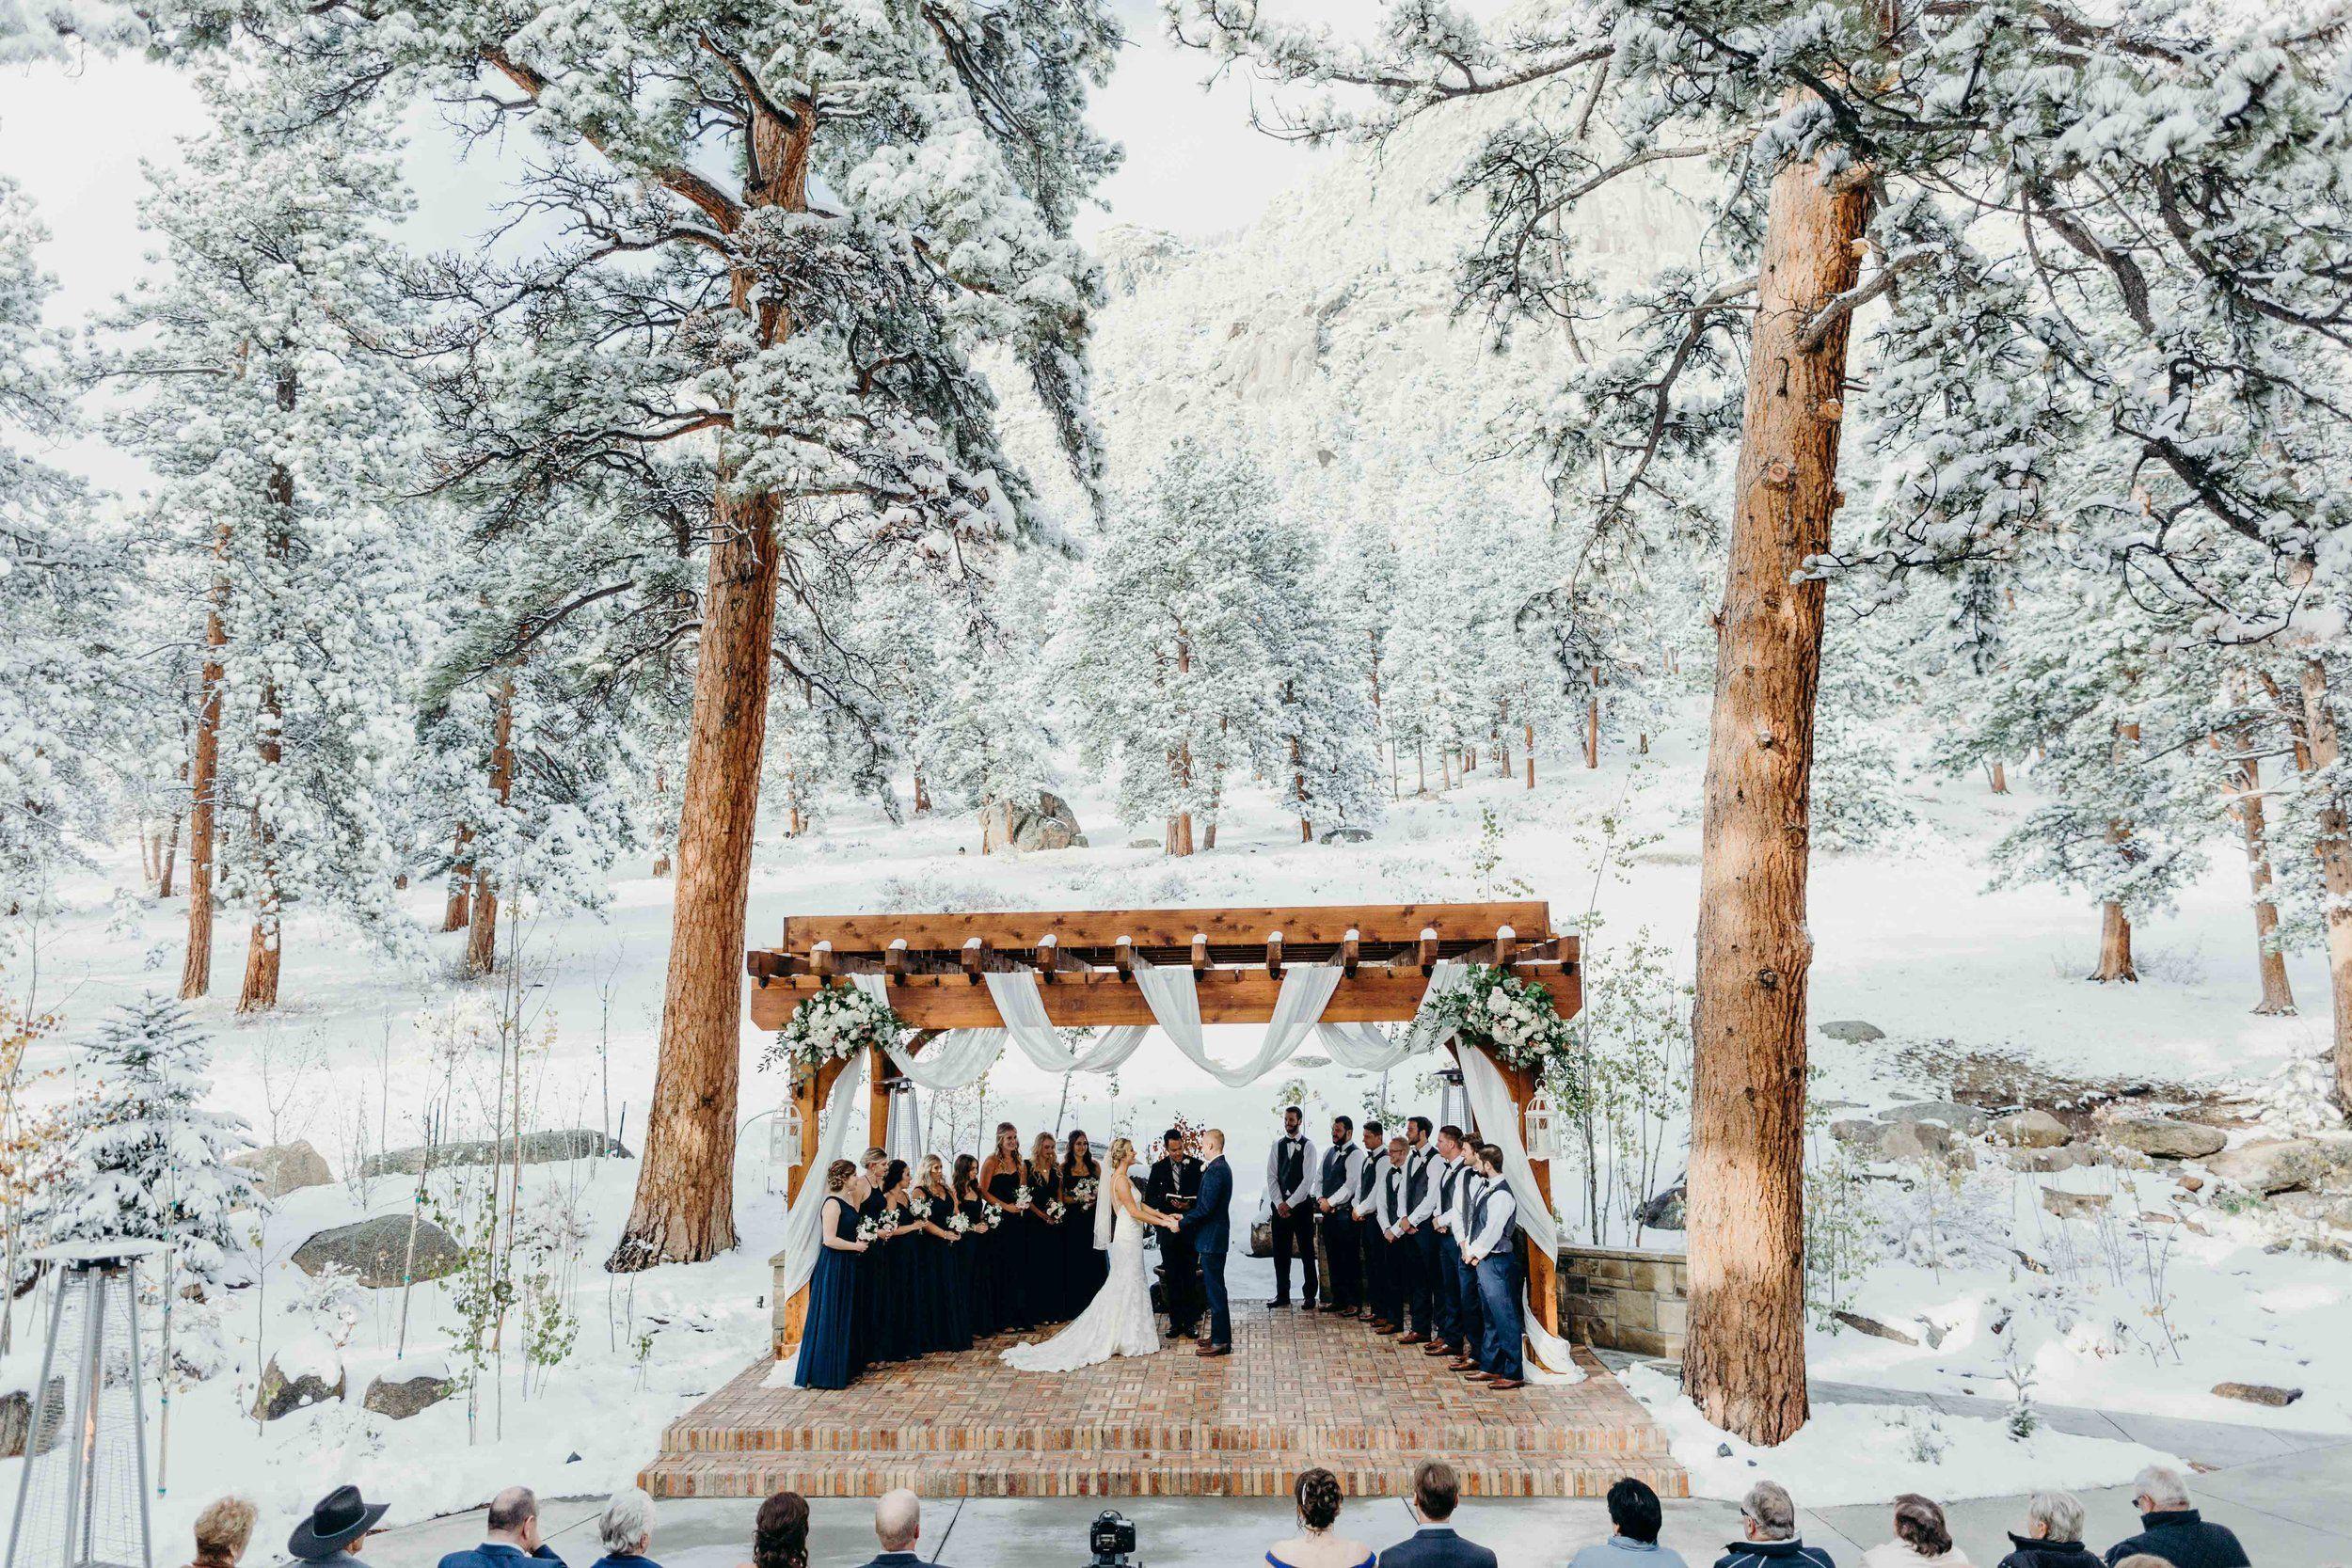 Snowy Mountain Wedding at the Della Terra Mountain Chateau ...